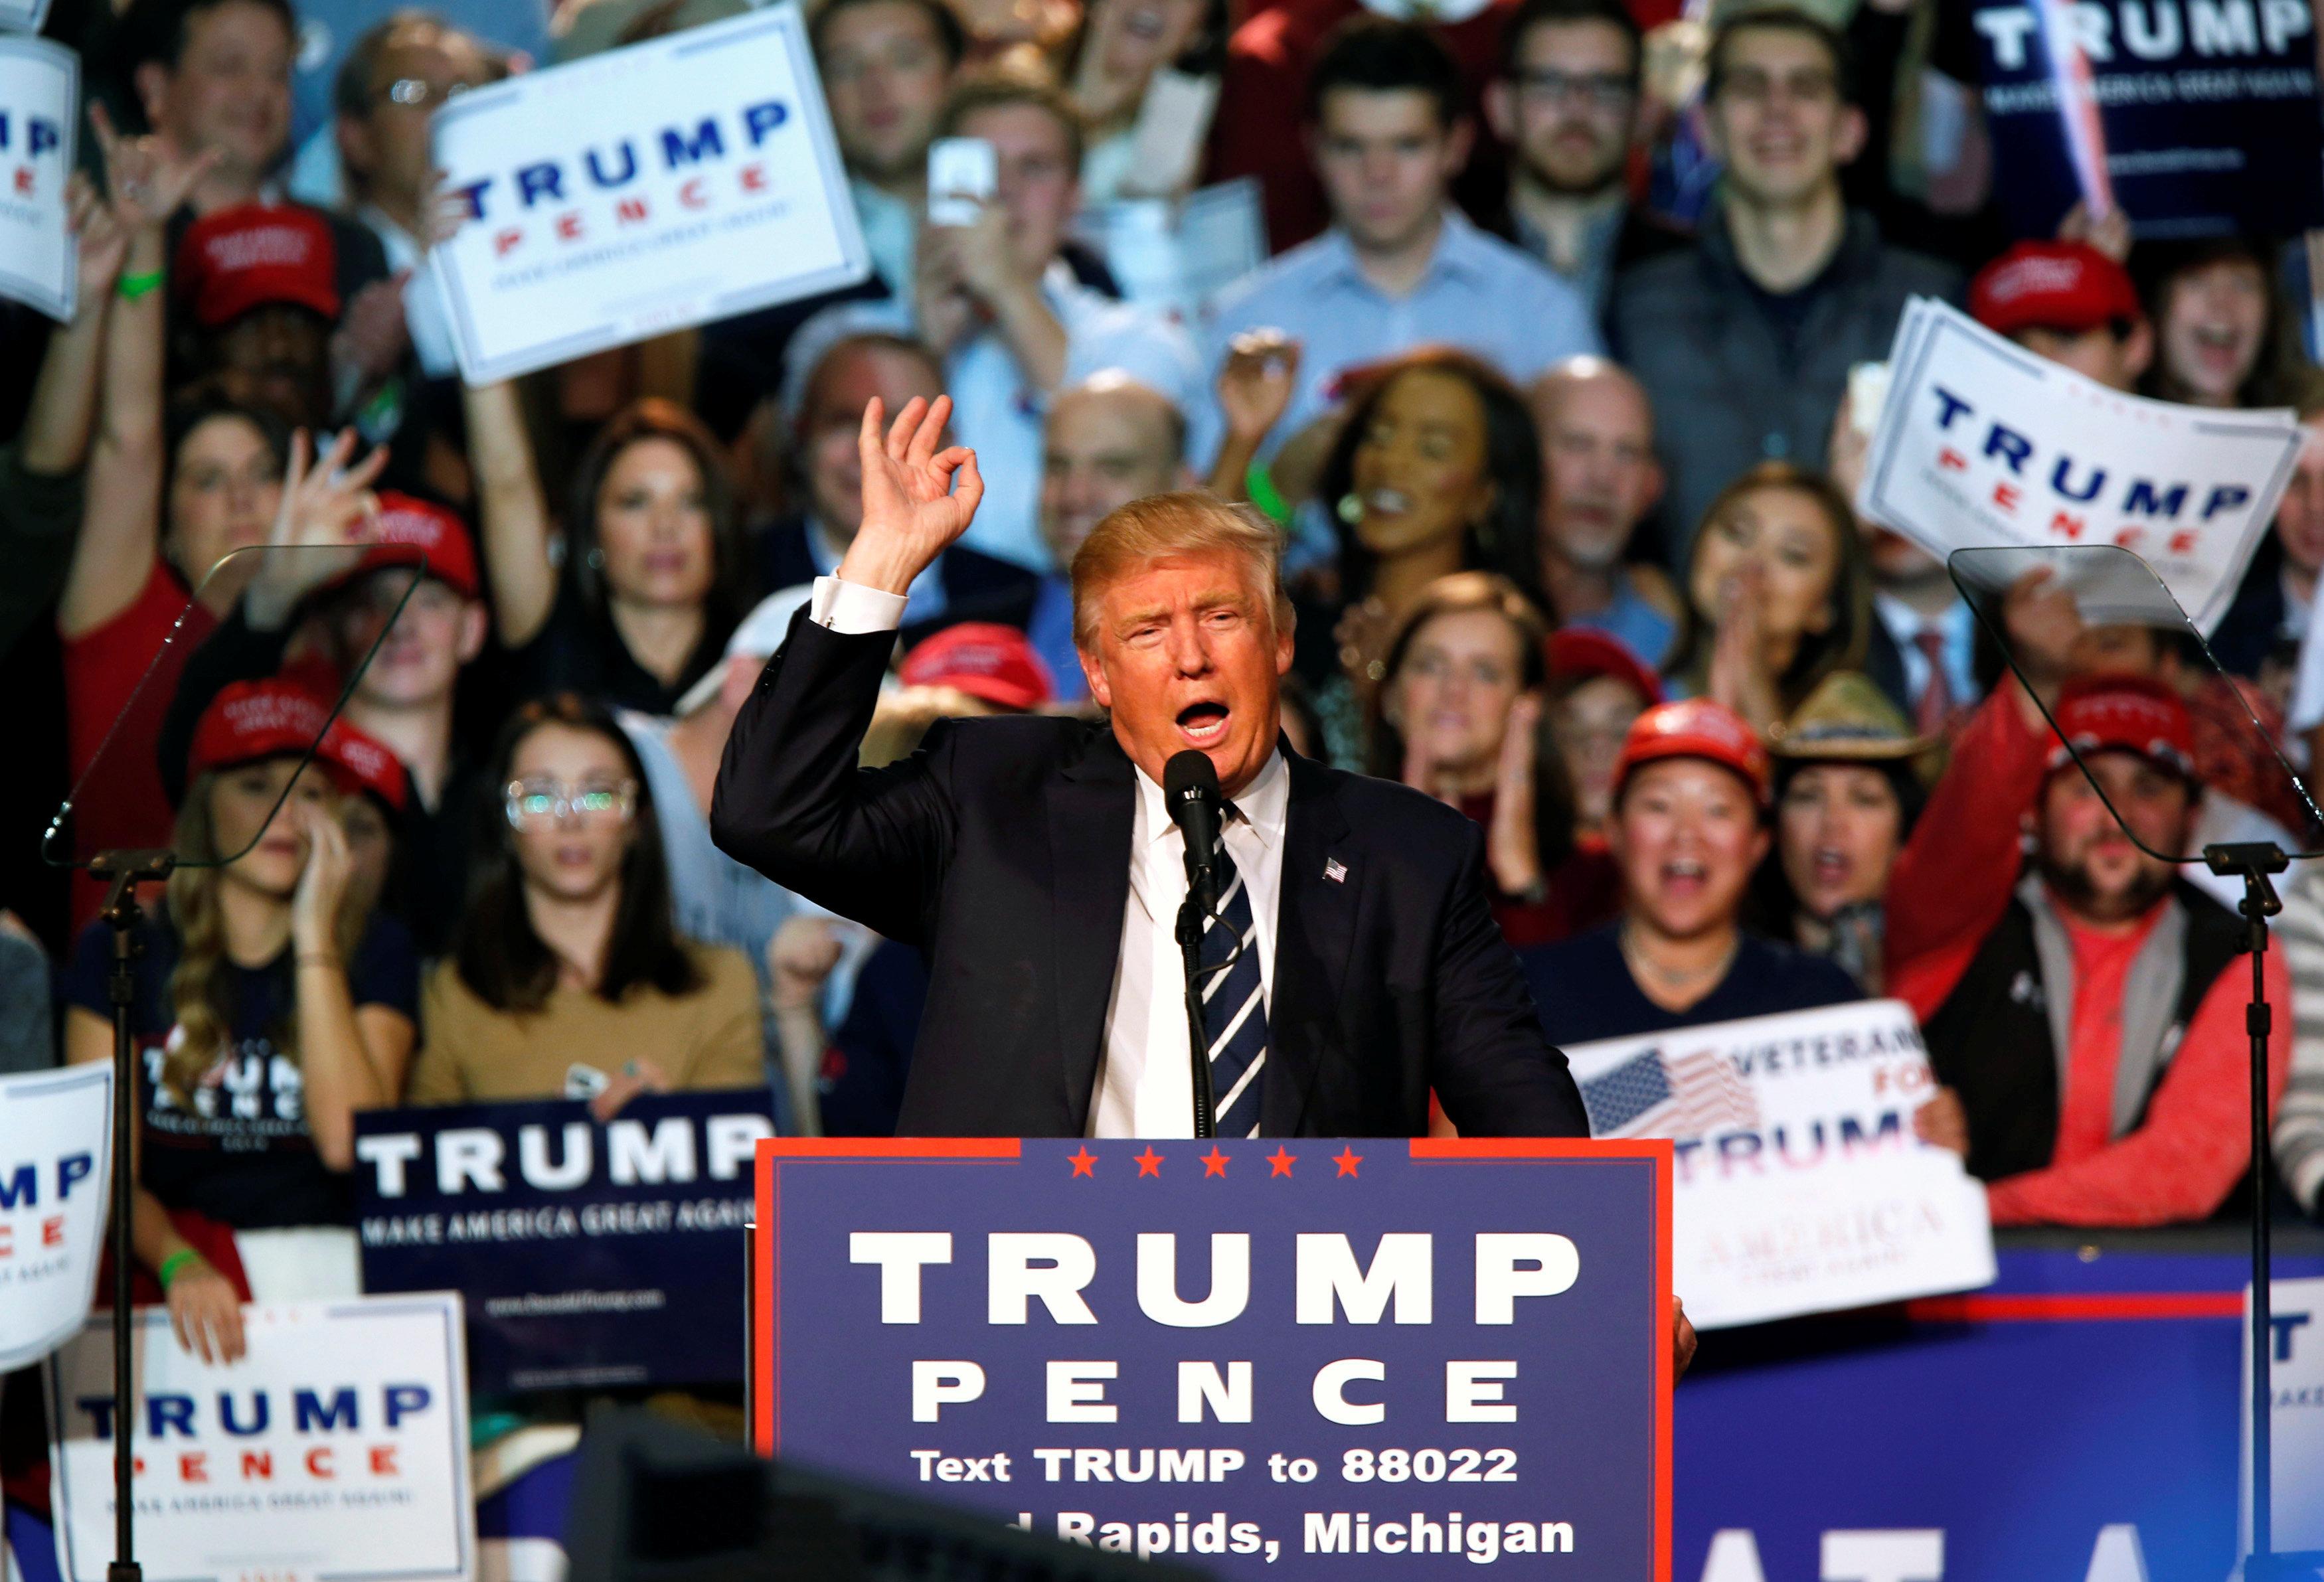 U.S. Republican presidential nominee Donald Trump speaks at his final campaign event at the Devos Place in Grand Rapids, Michigan November 8, 2016.  REUTERS/Rebecca Cook